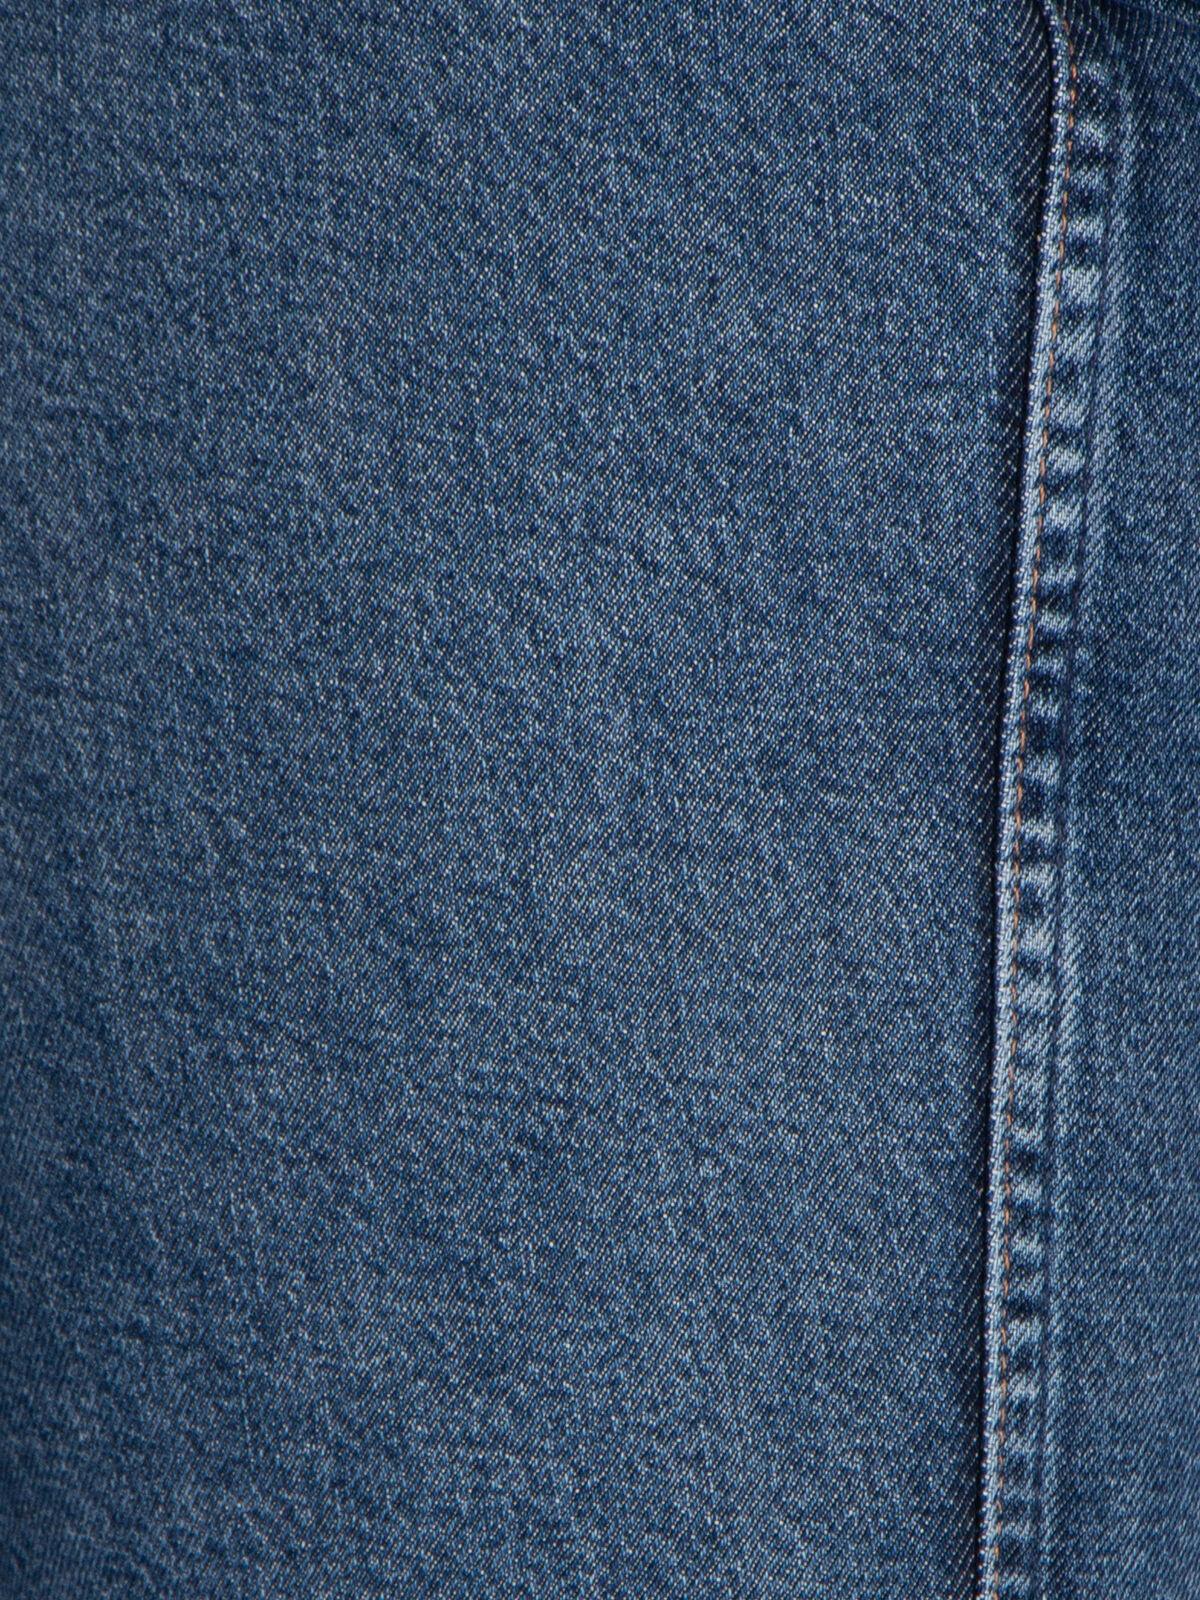 Retro Skinny Jeans